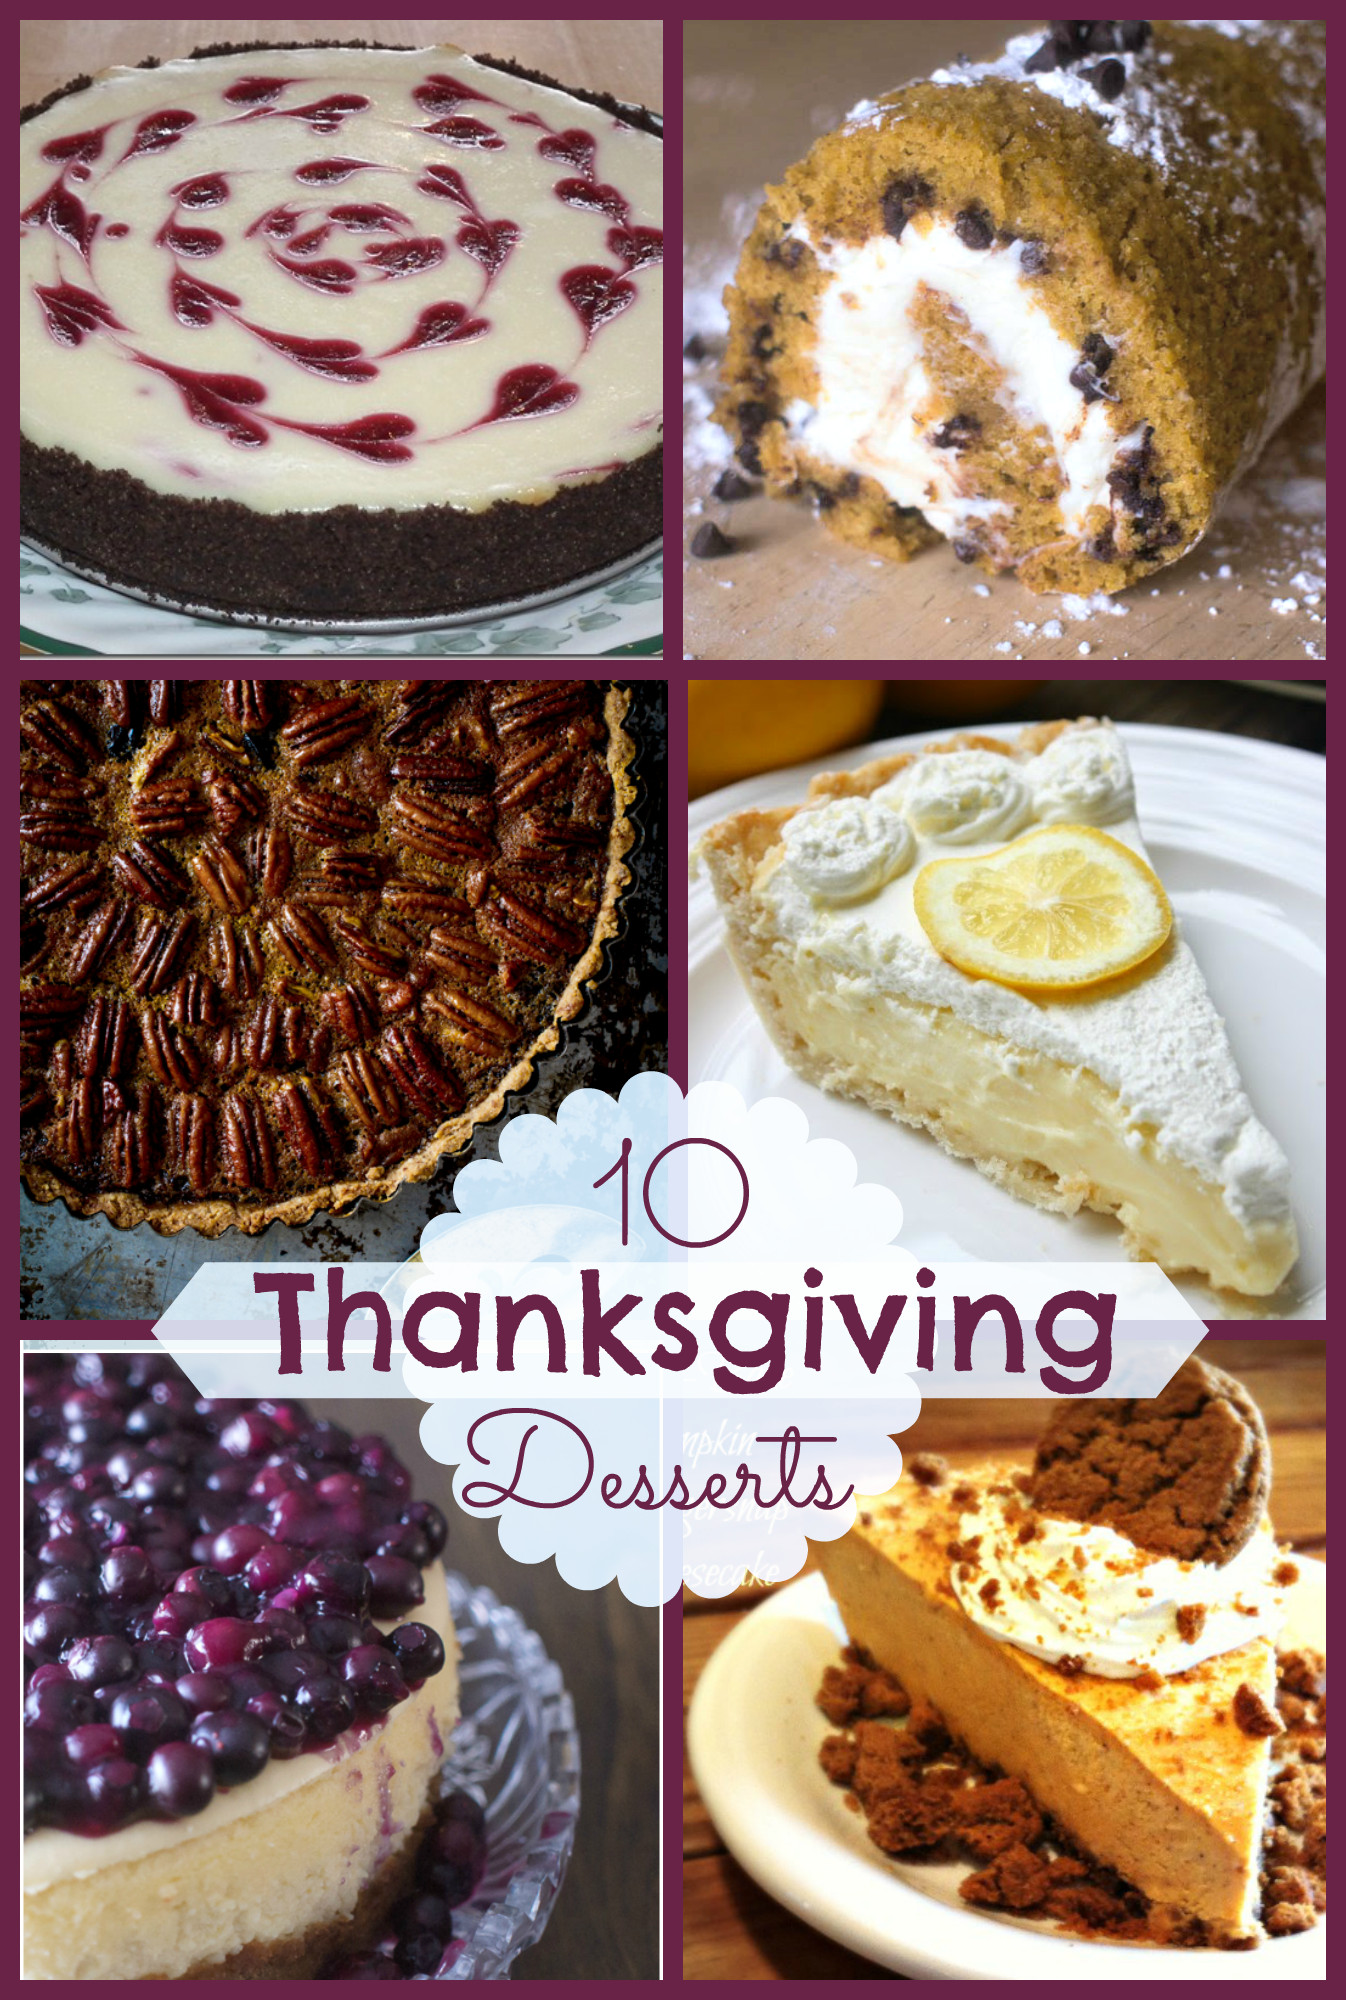 The Best Thanksgiving Desserts  10 Fabulous Thanksgiving Desserts